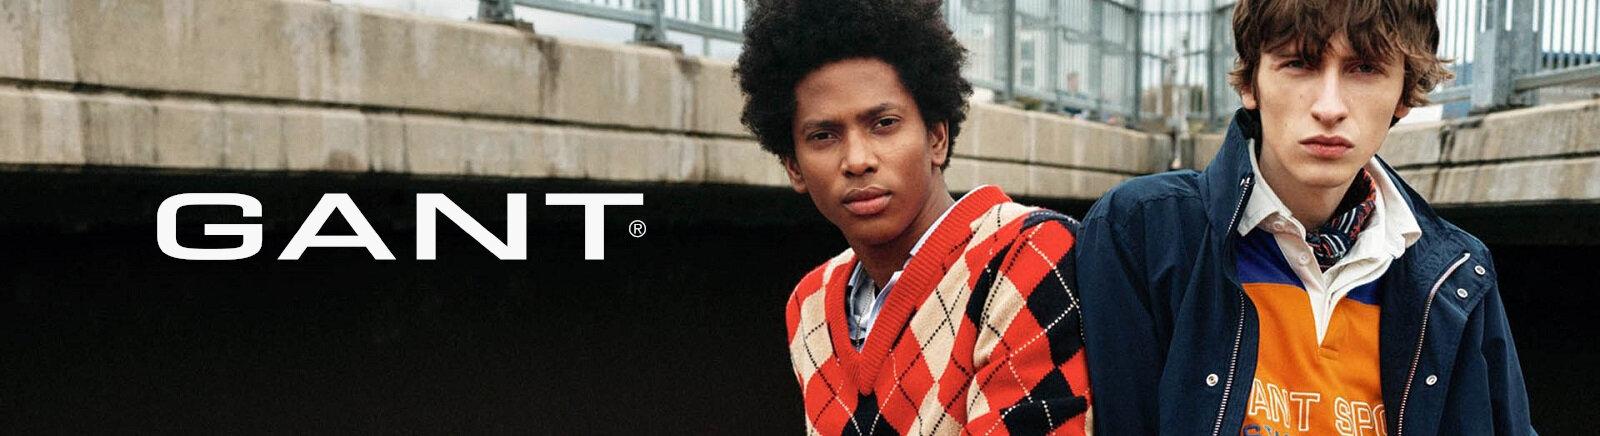 Gisy: Gant Trotteur für Damen online shoppen